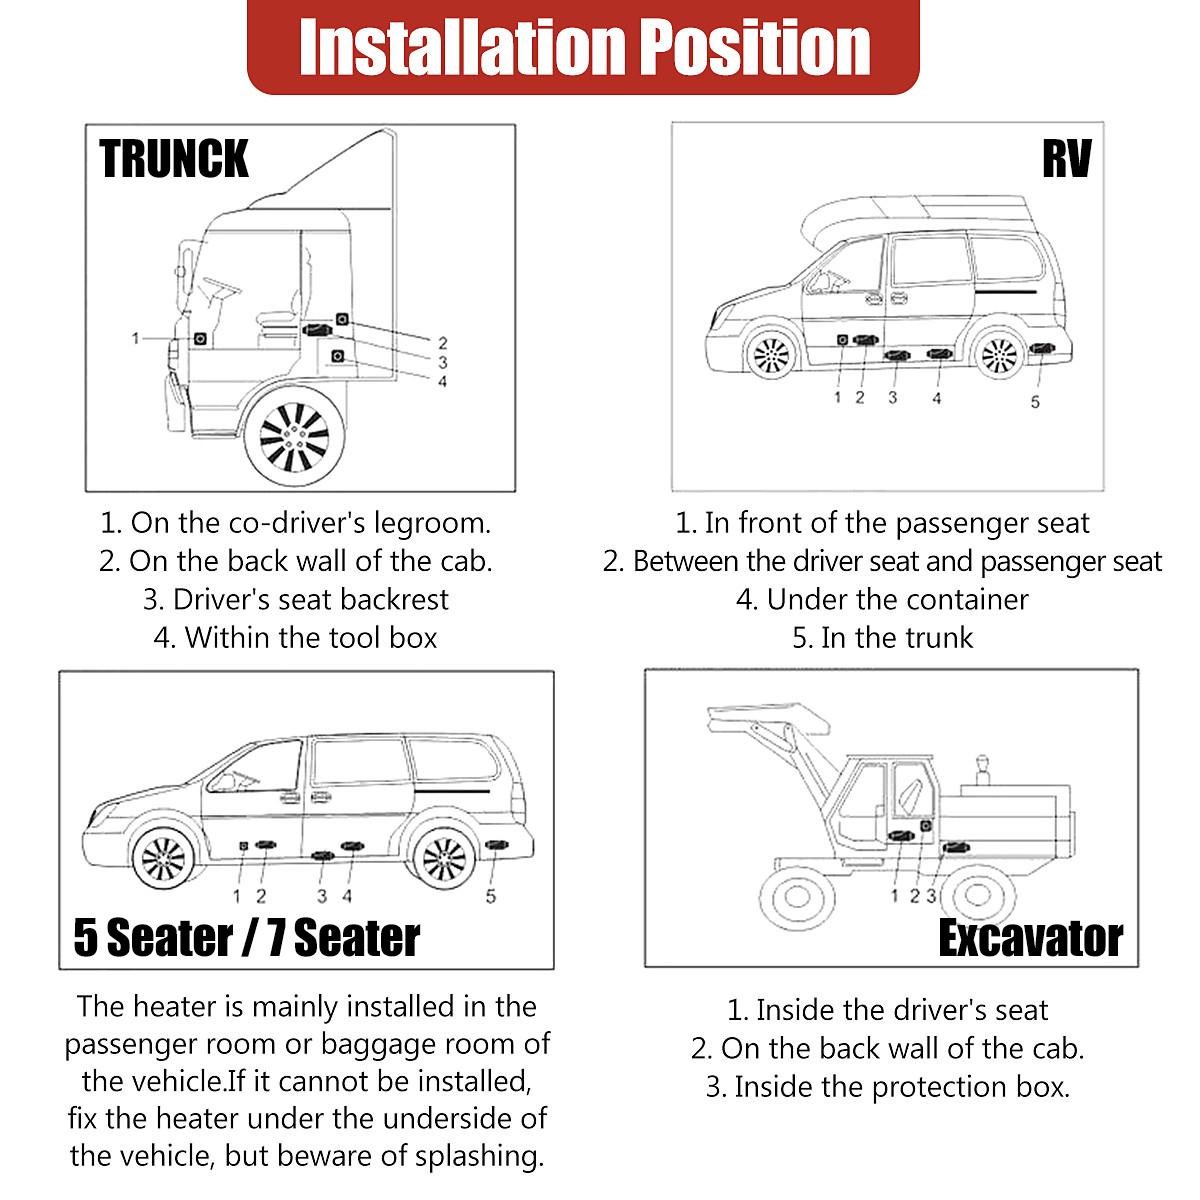 Air Heater Diesel Fuel Cabin Air Heater Kit Fuel Diesel Parking Pump Parking Heater 1-8KW 12V Air Diesels Heater for Car Truck Battery Vehicles